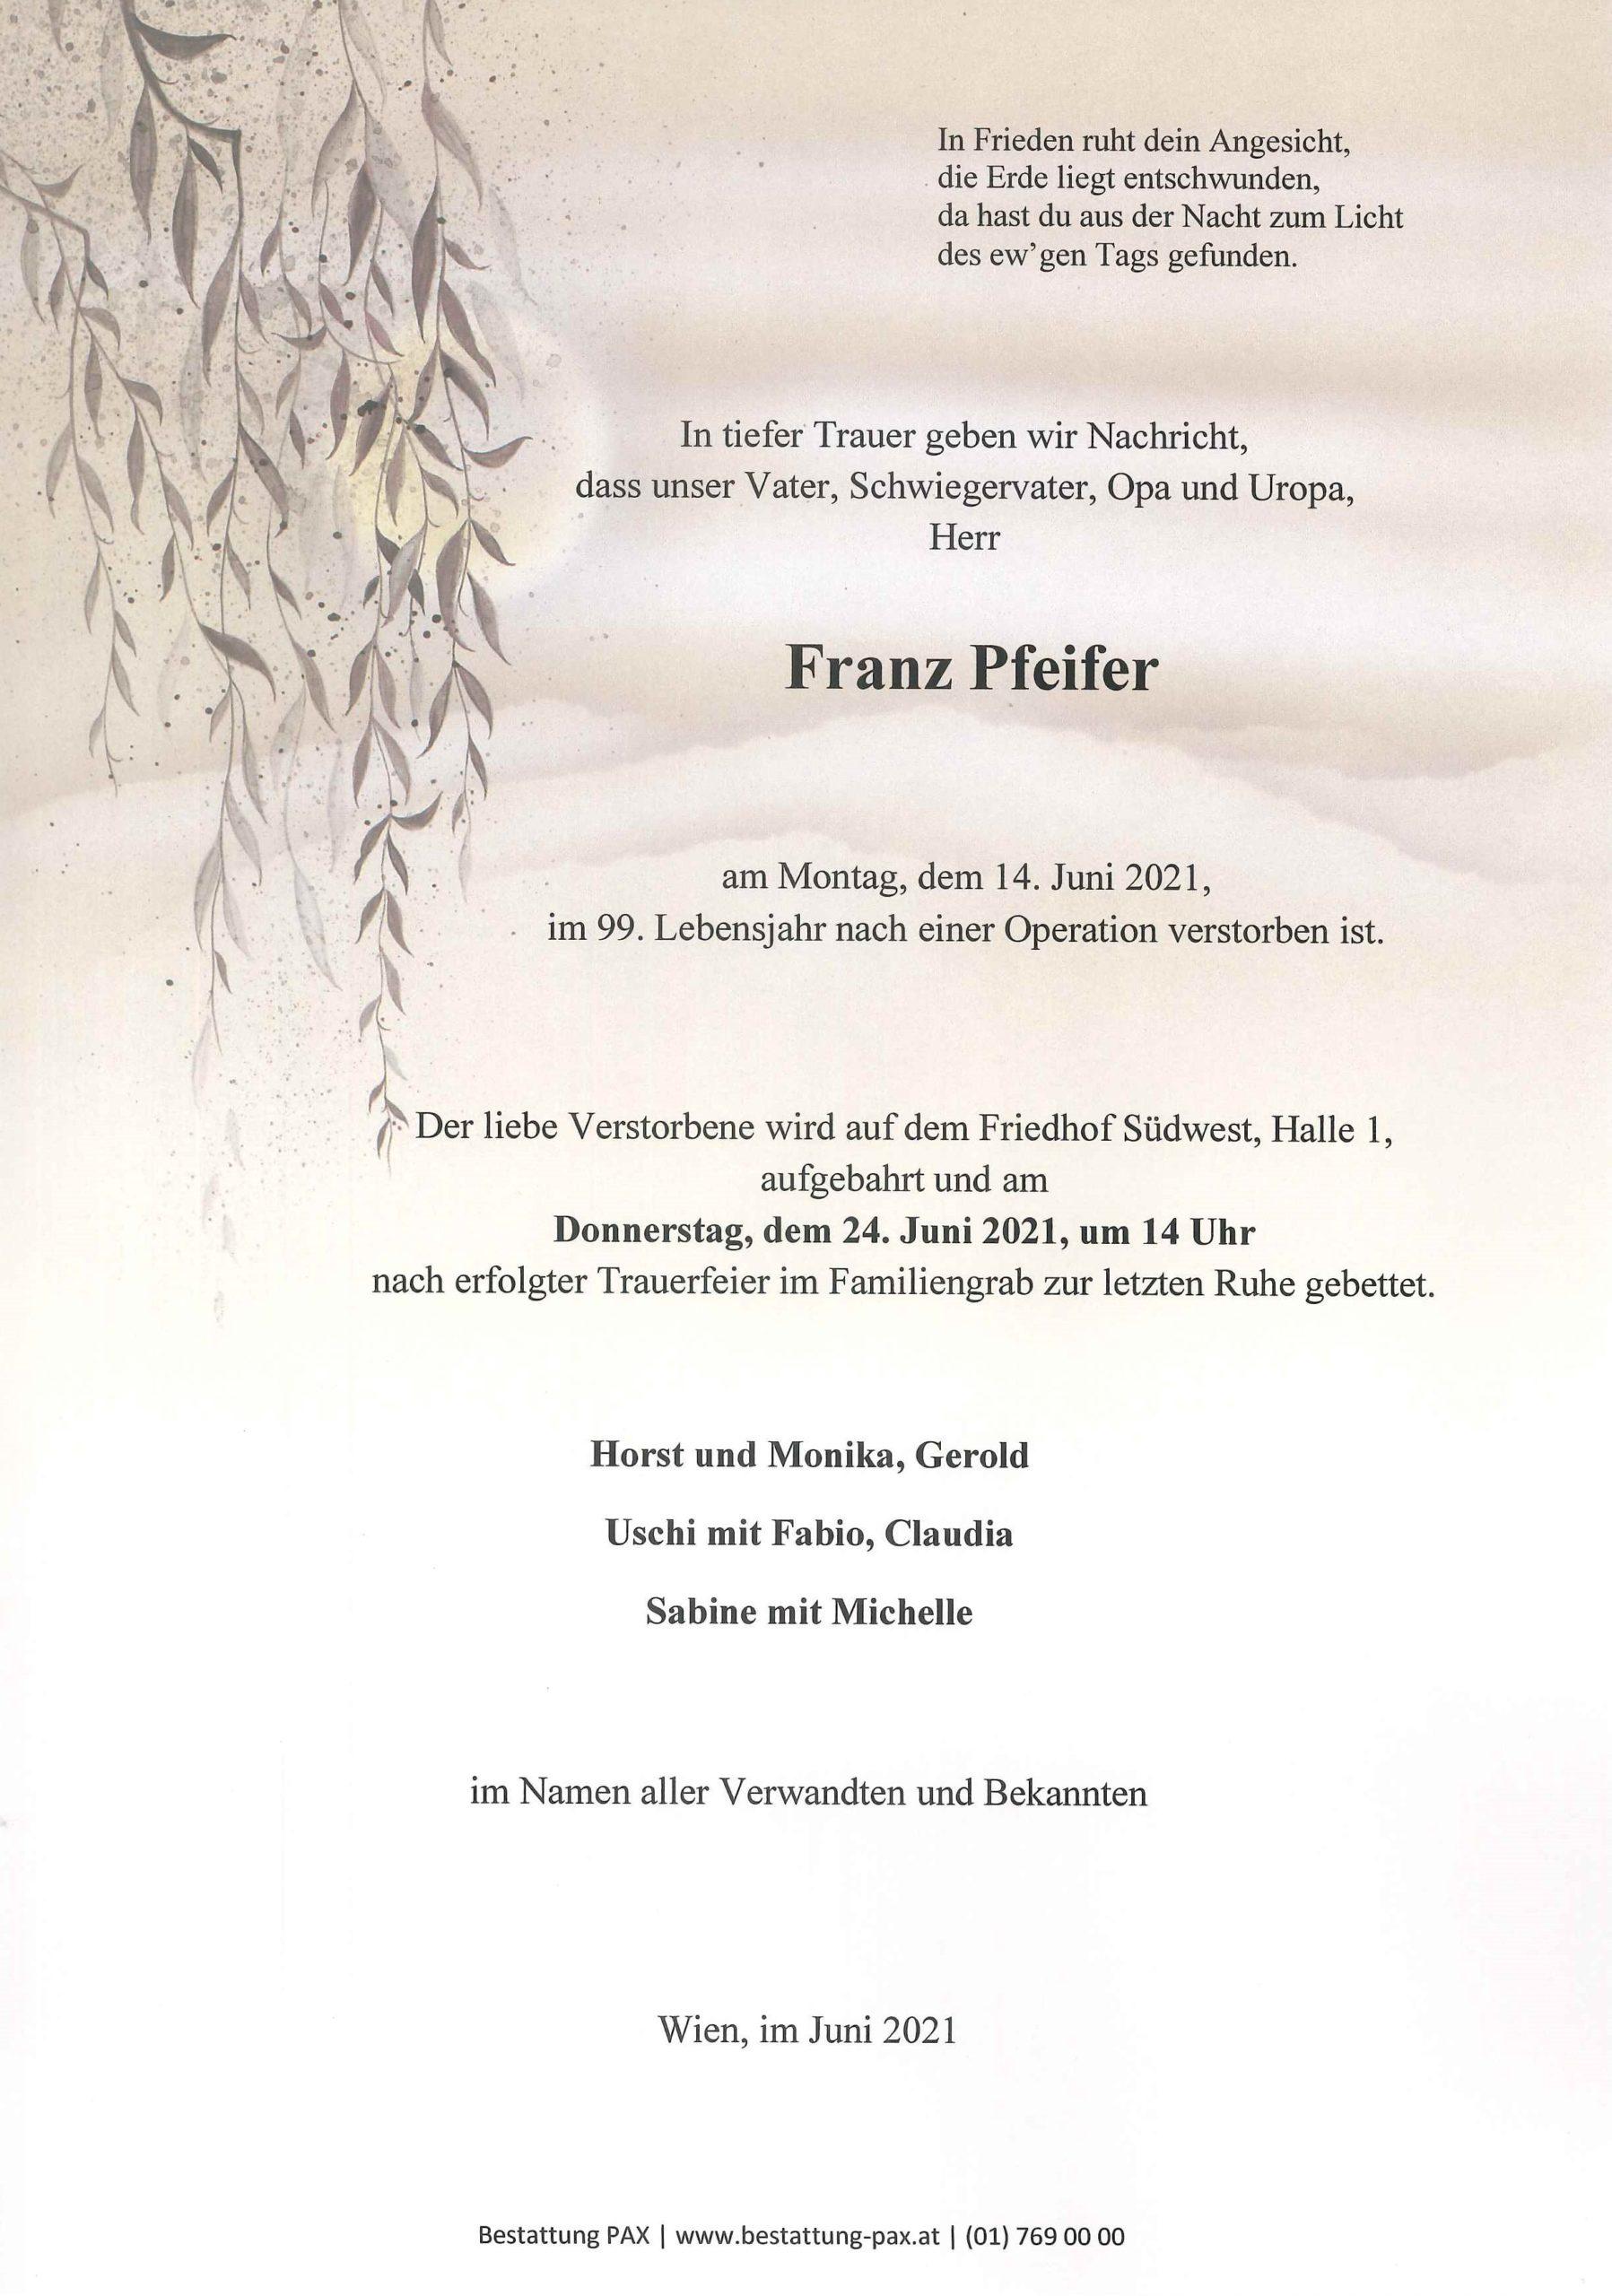 Franz Pfeifer